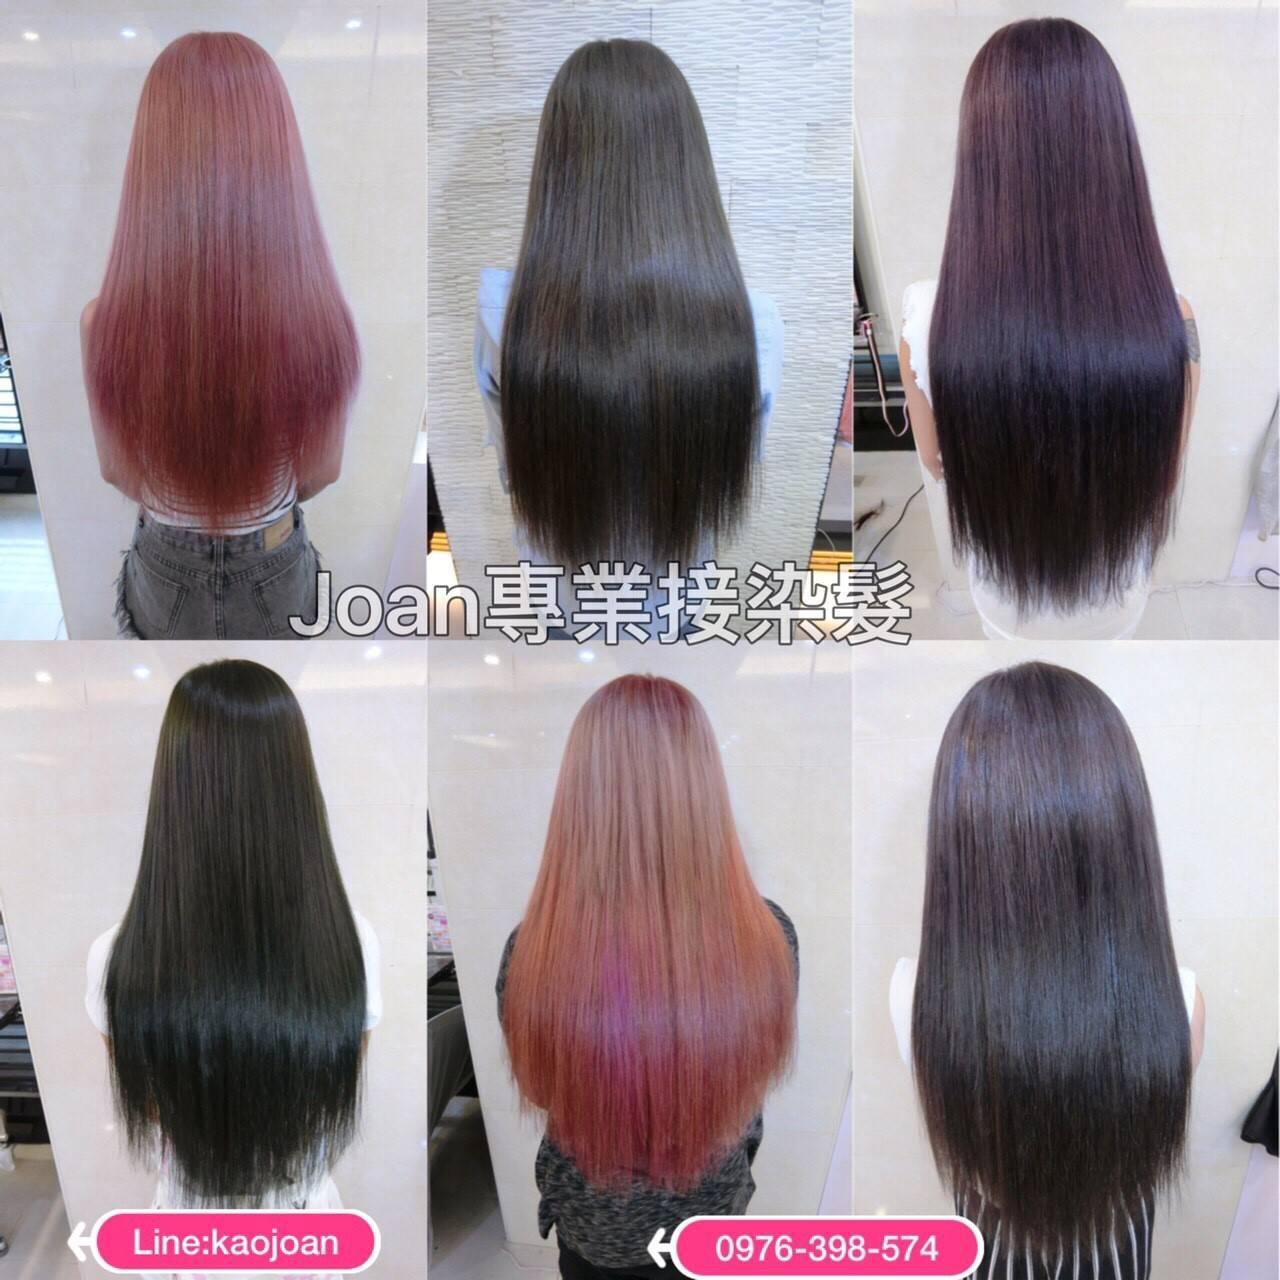 Joan Hair Design 接髮染燙